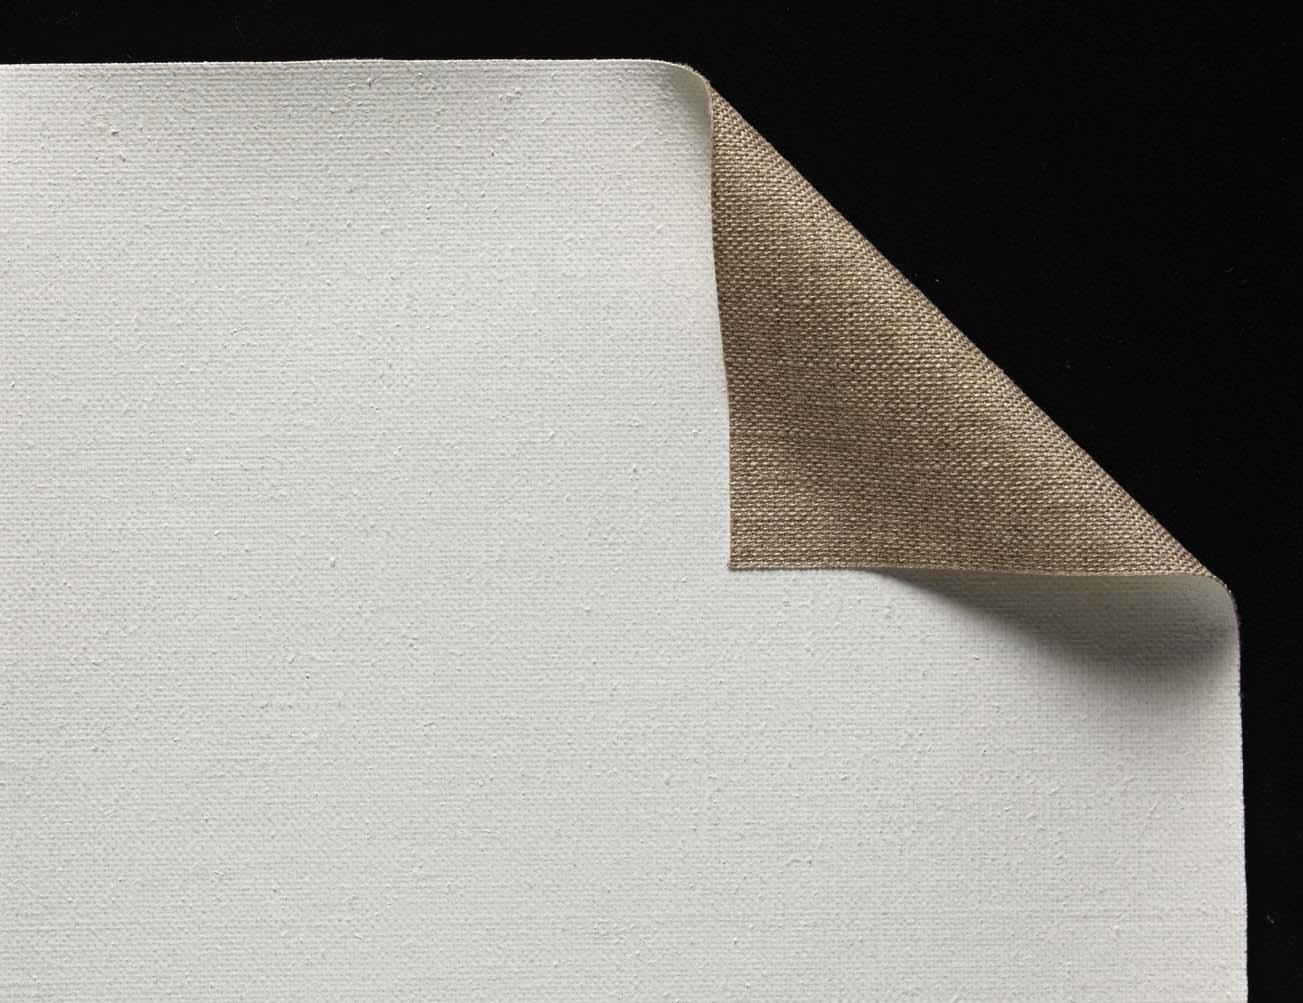 canvas 700 2 10 m canvas claessens artists 39 canvas. Black Bedroom Furniture Sets. Home Design Ideas